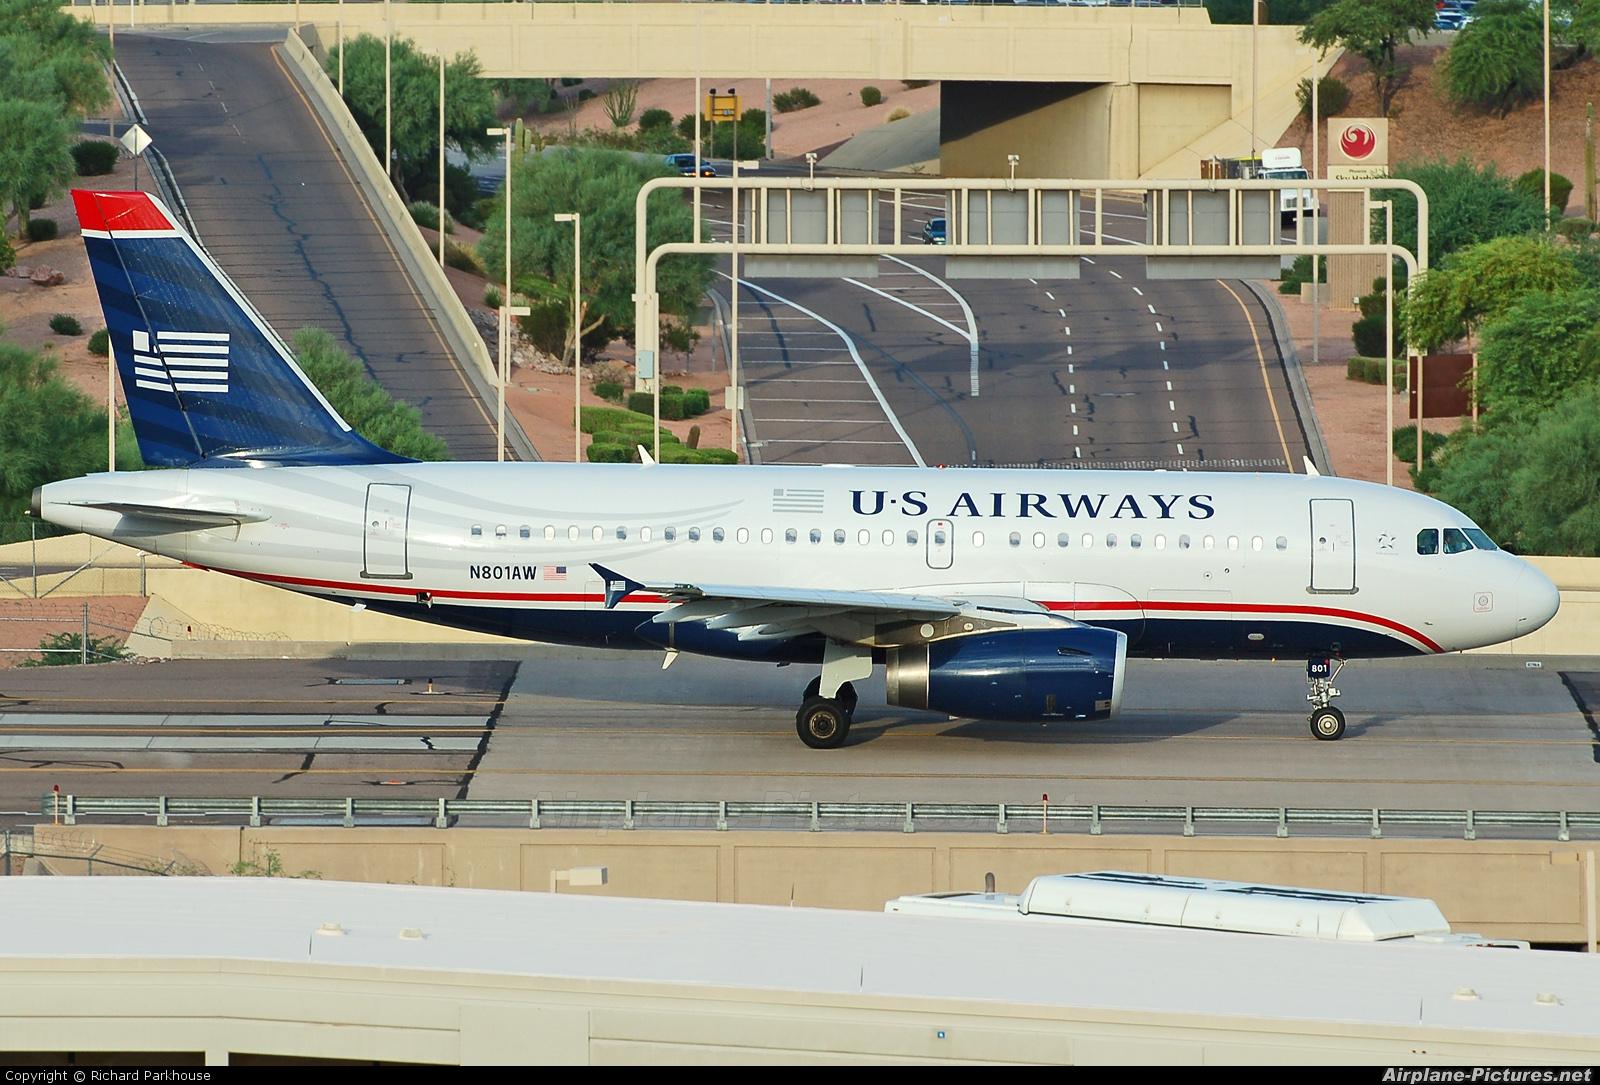 US Airways N801AW aircraft at Phoenix - Sky Harbor Intl